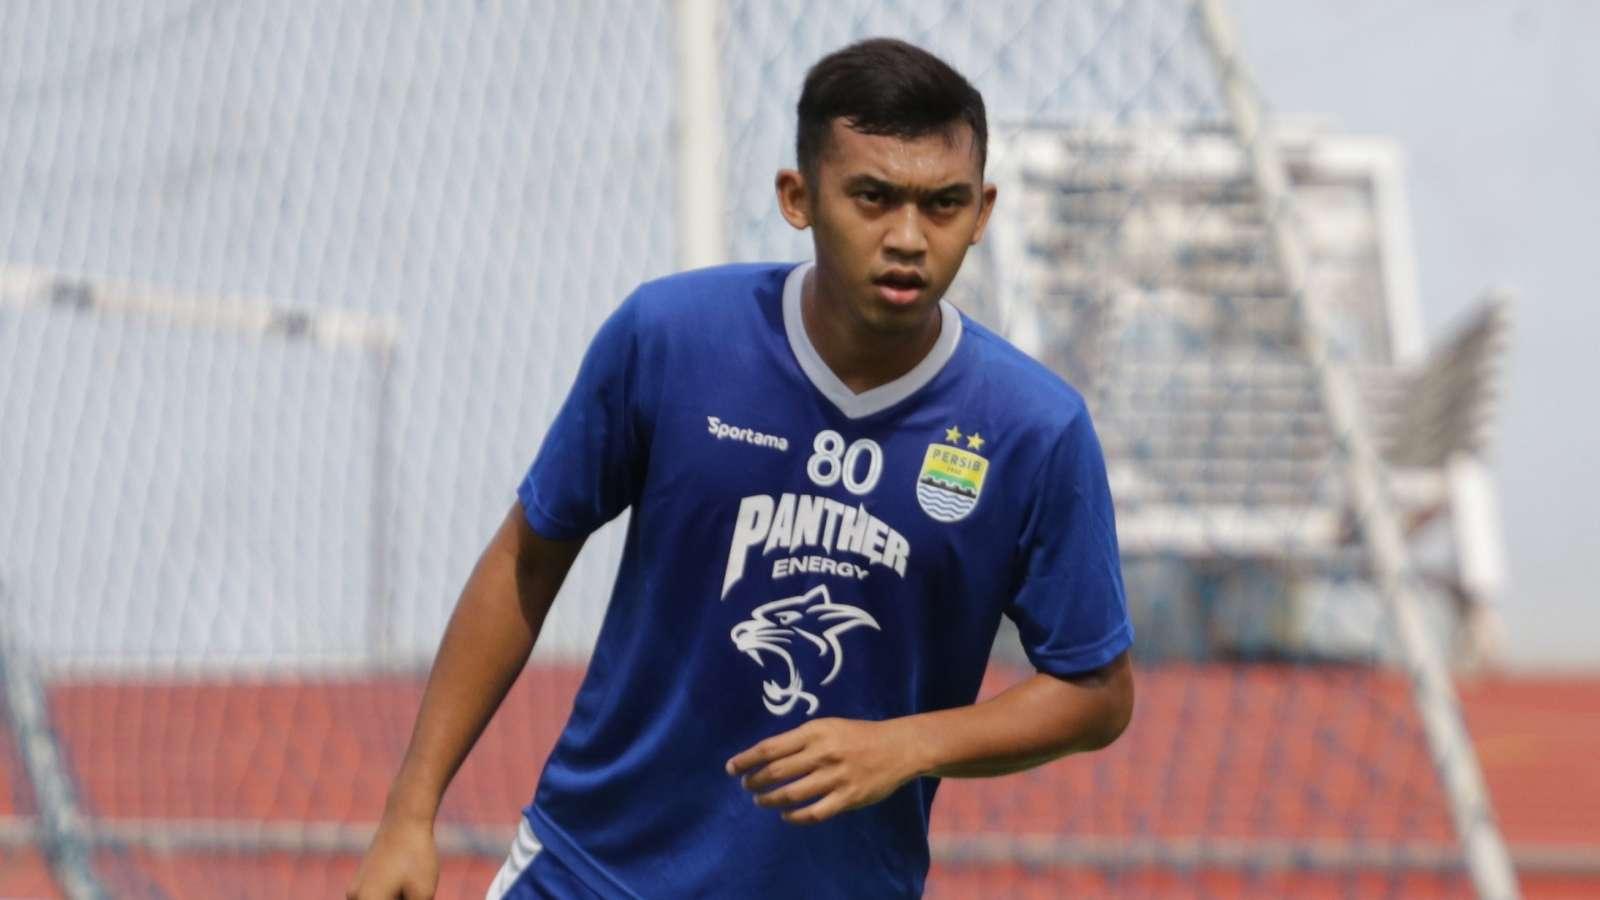 Kondisi Abdul Aziz Terjaga Lewat Program Latihan Persib Bandung